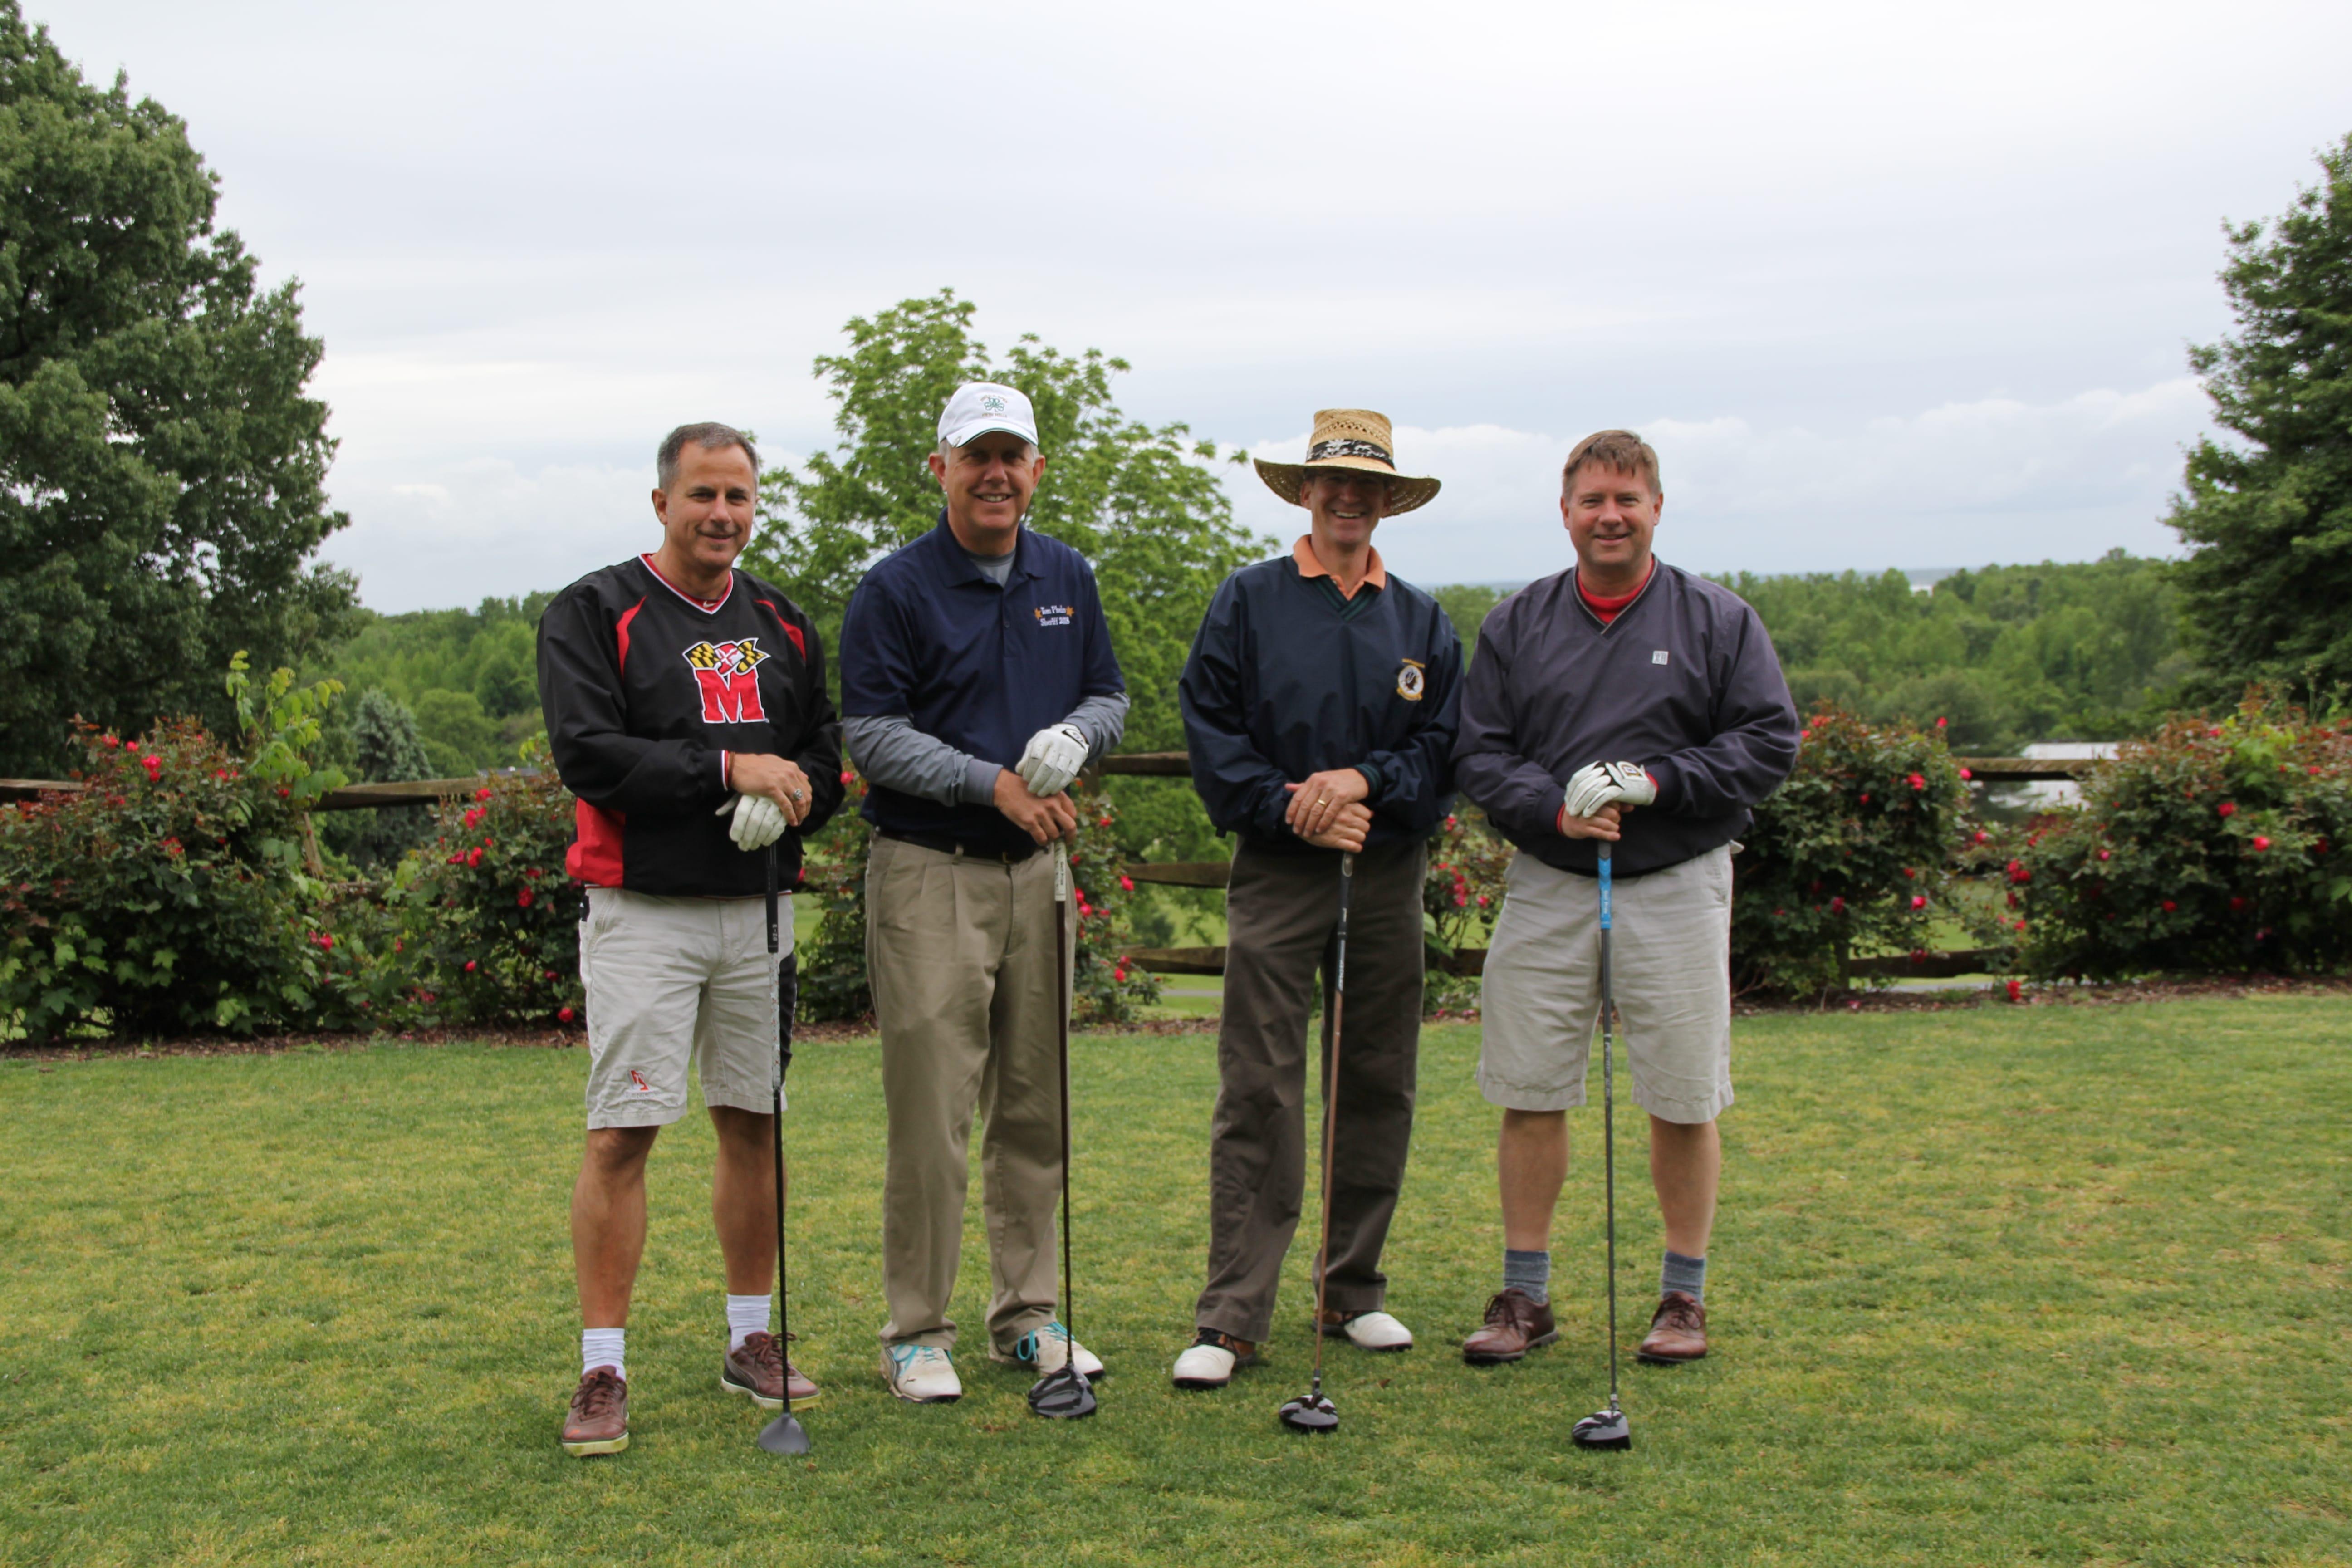 IMG_5896 - Team 2 - Tom Phelan, Gerard Garay, Tom Gurney, Pete Ulrich